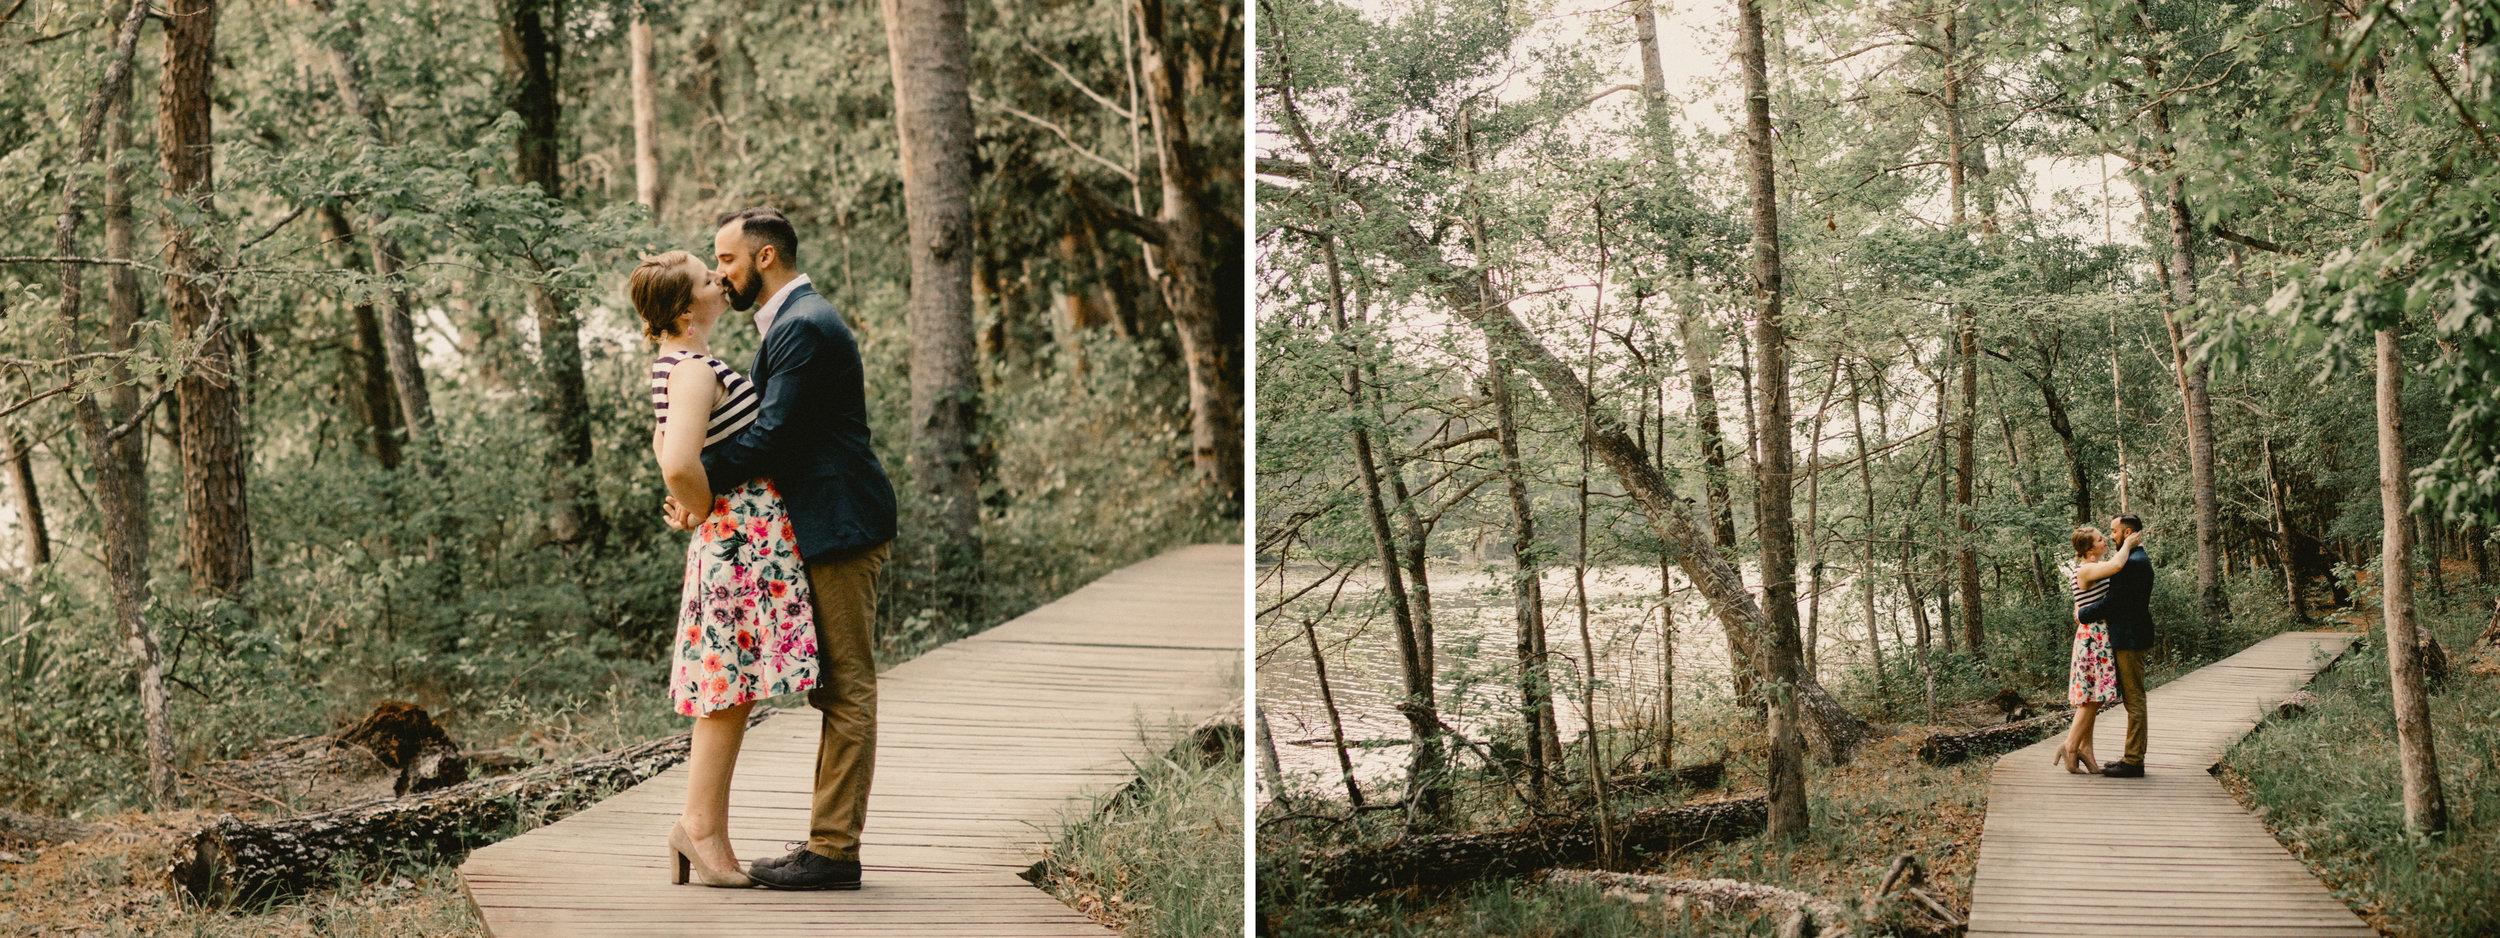 kissing on a bridge.jpg